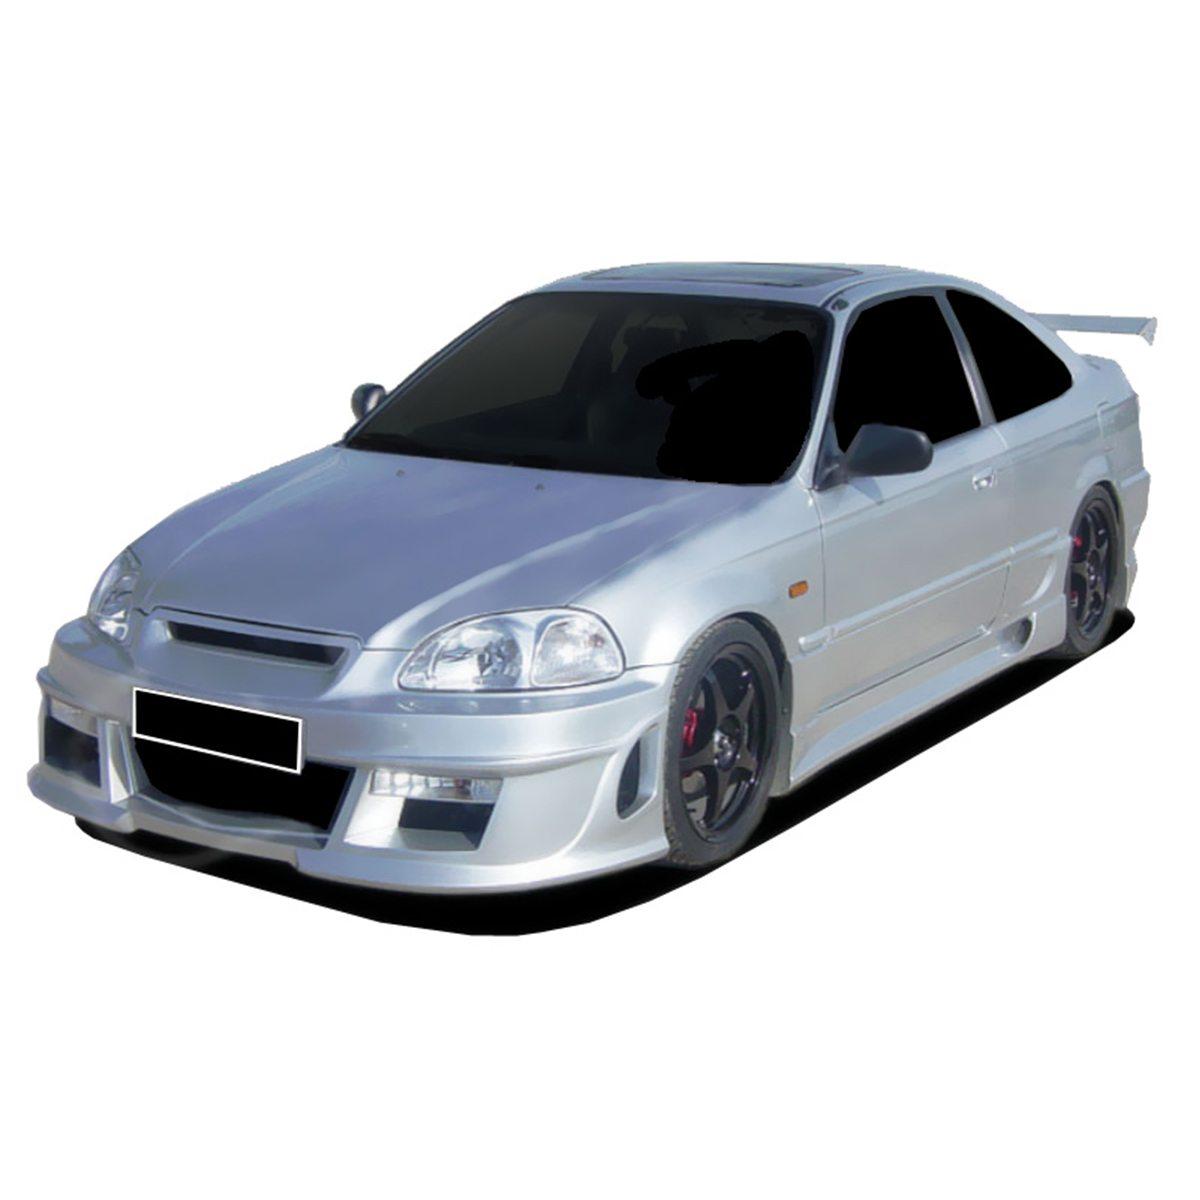 Honda-Civic-98-Coupe-Twister-Frt-PCA042